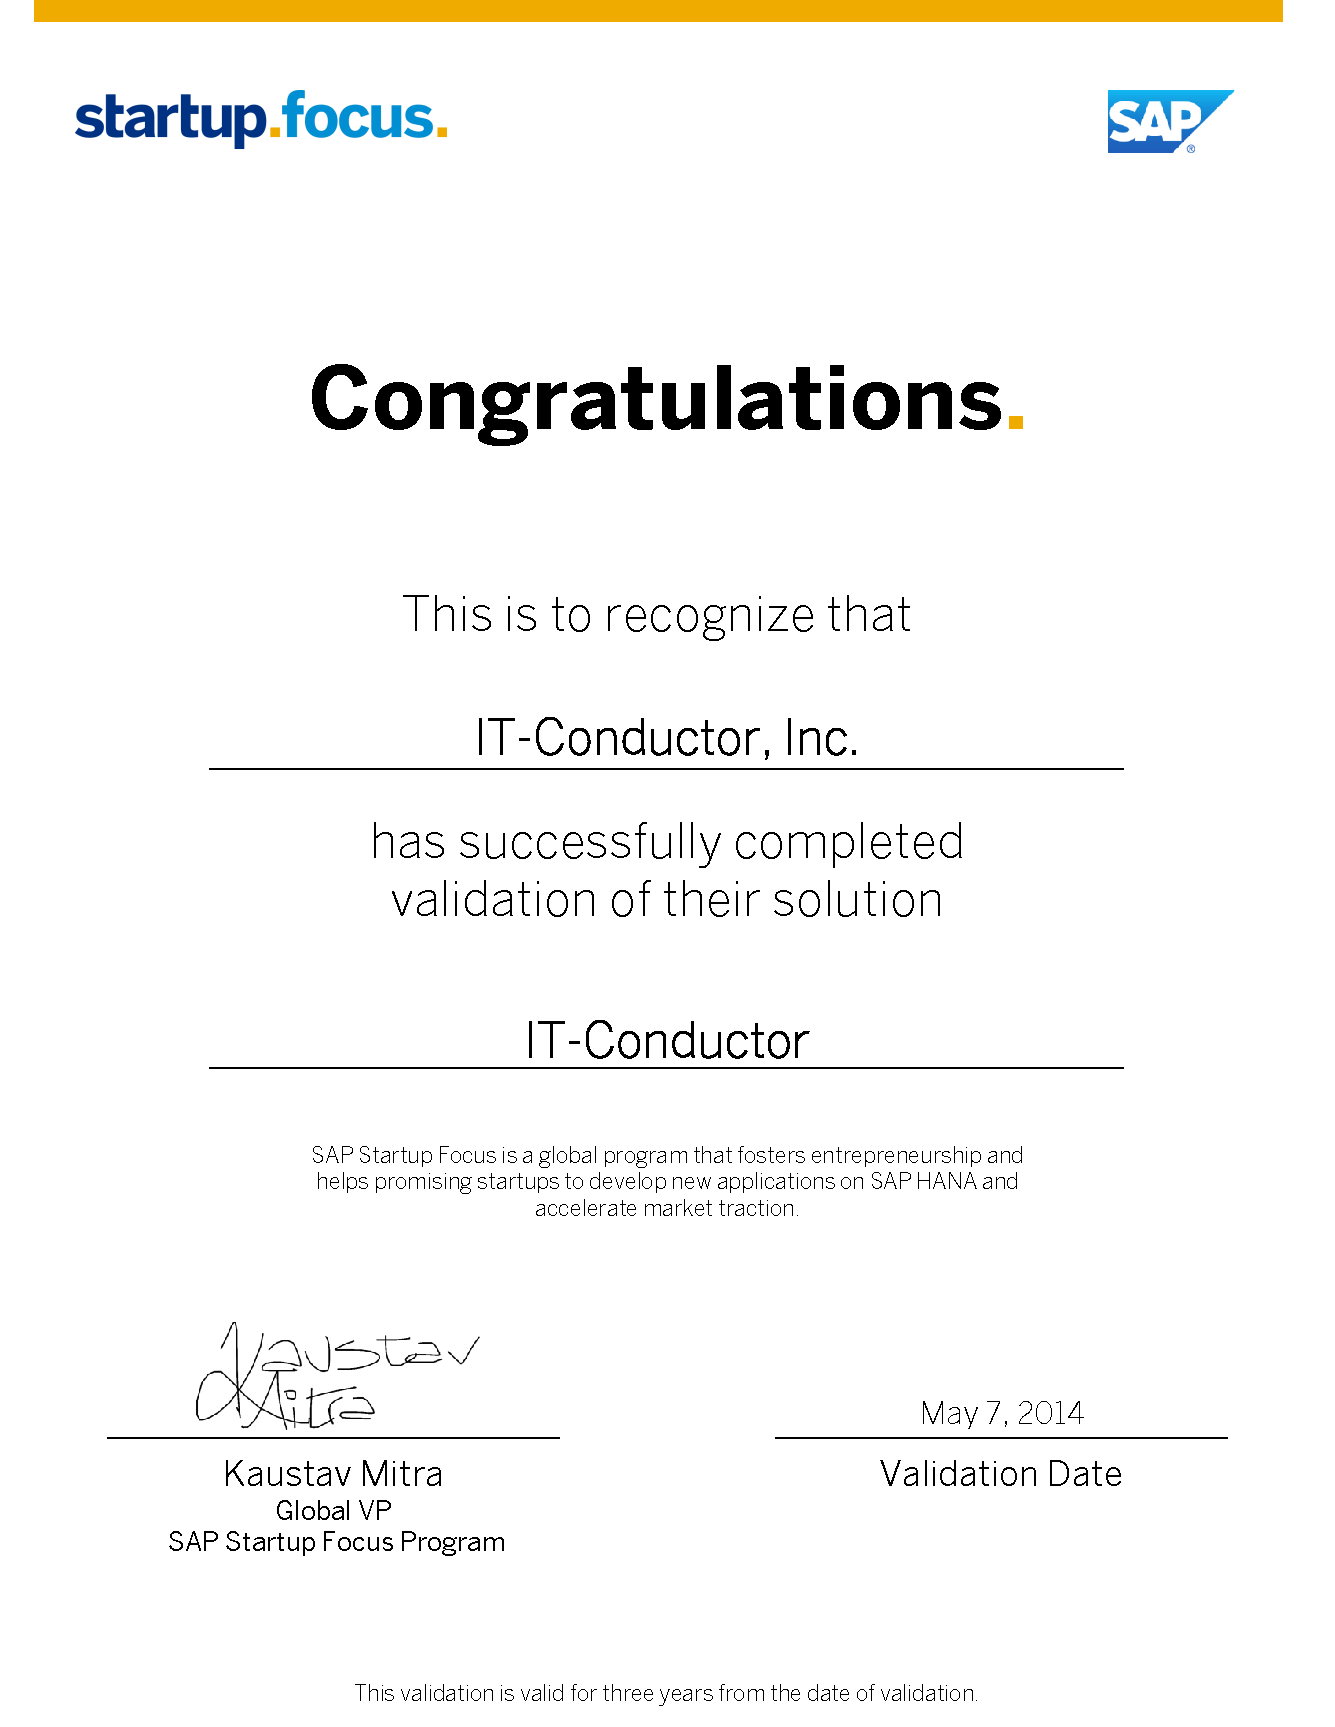 SAP_SFP_Validation-Certificate-IT-ConductorInc-May-7-2014